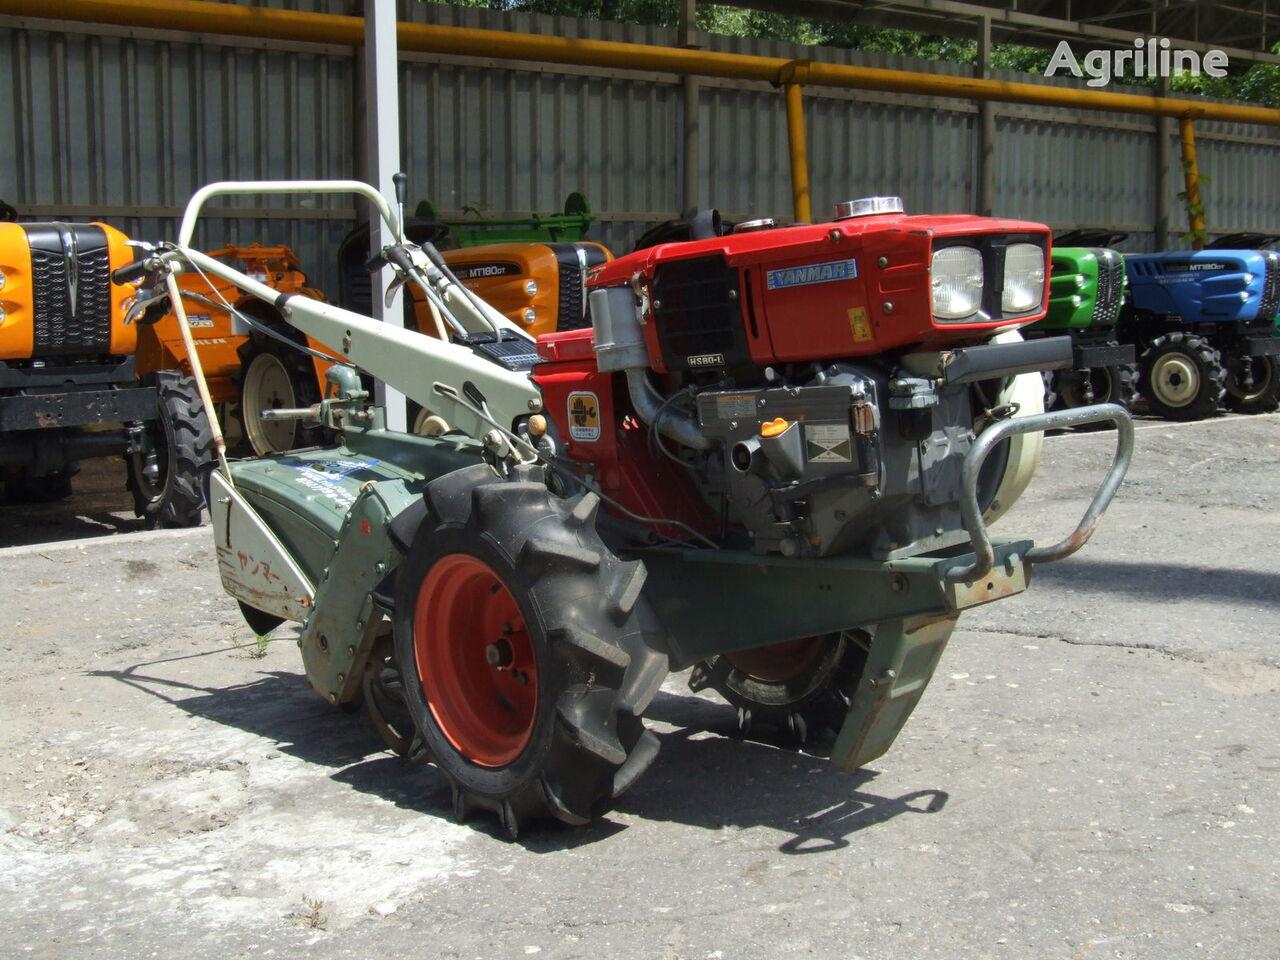 YANMAR YHS800-HS80-L motobineuse